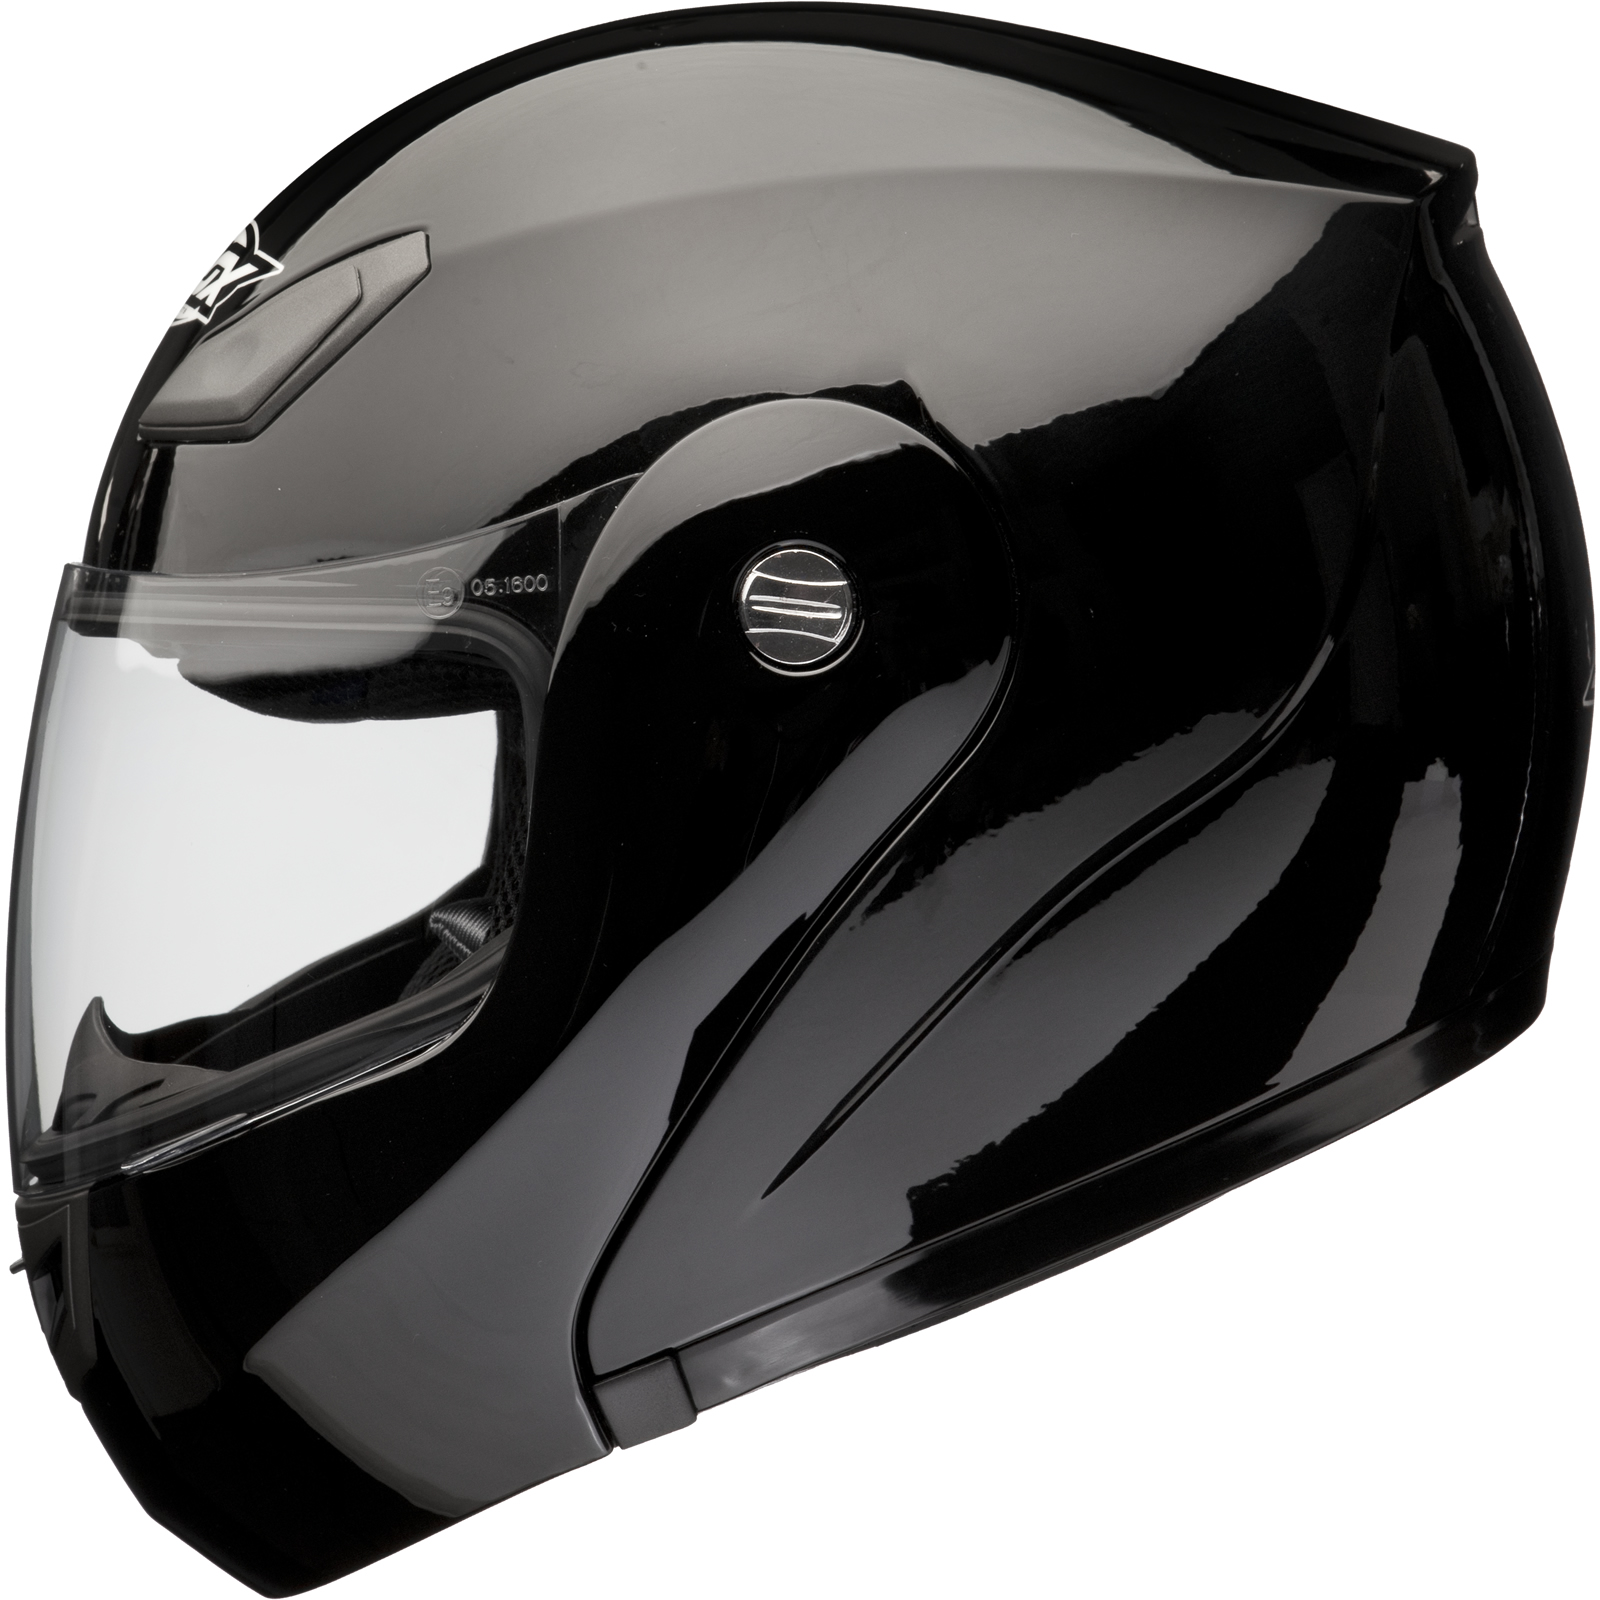 shox bullet moto scooter motard motarde casque modulable avec visi re teint e ebay. Black Bedroom Furniture Sets. Home Design Ideas